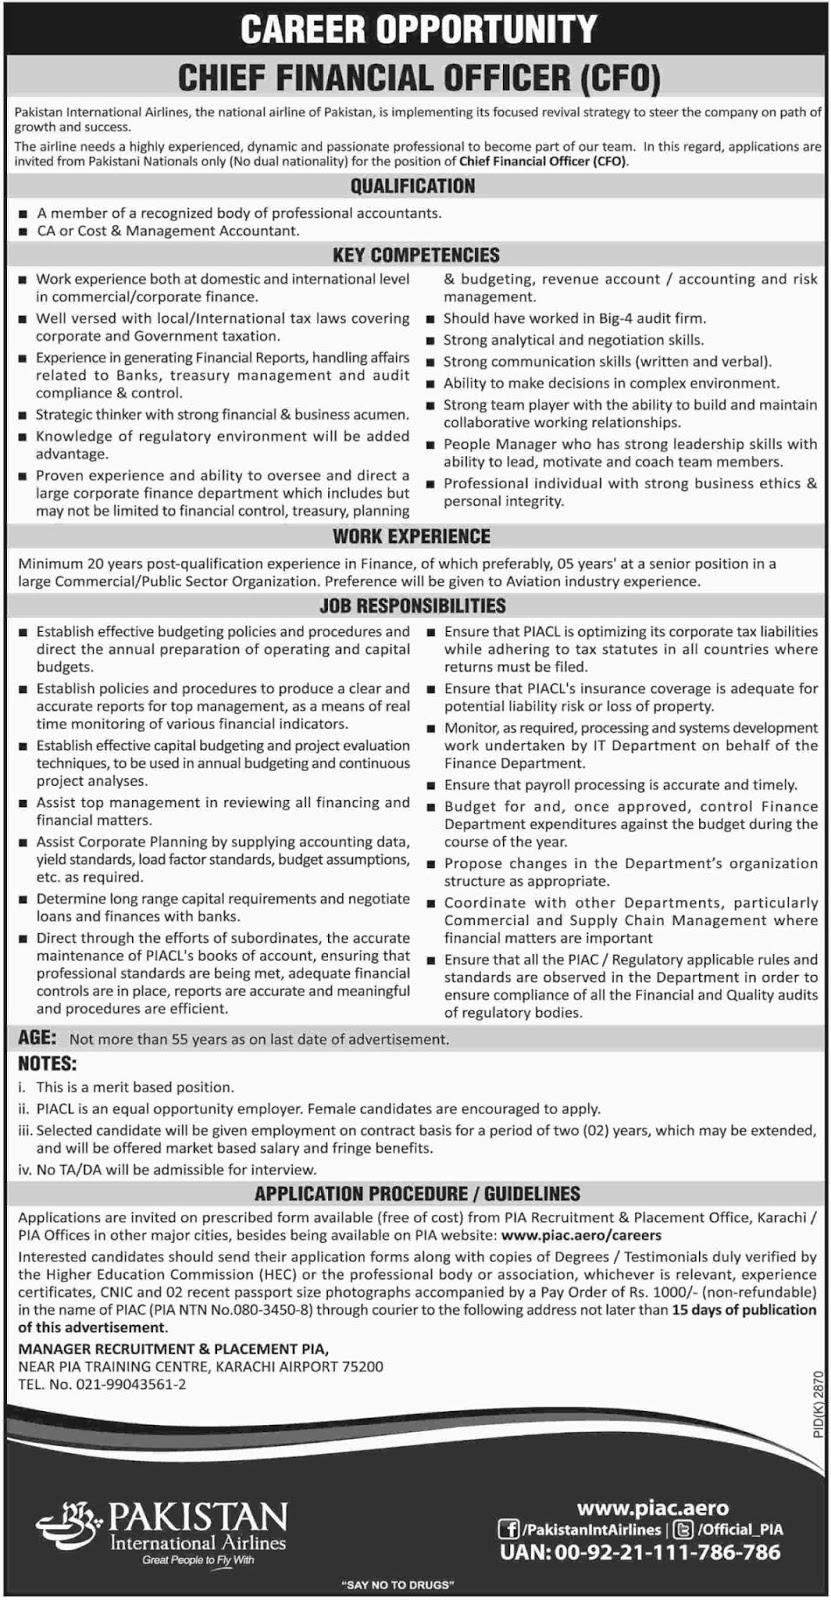 Pakistan International Airline Jobs 2019 | www.piac.com.pk | Download application form